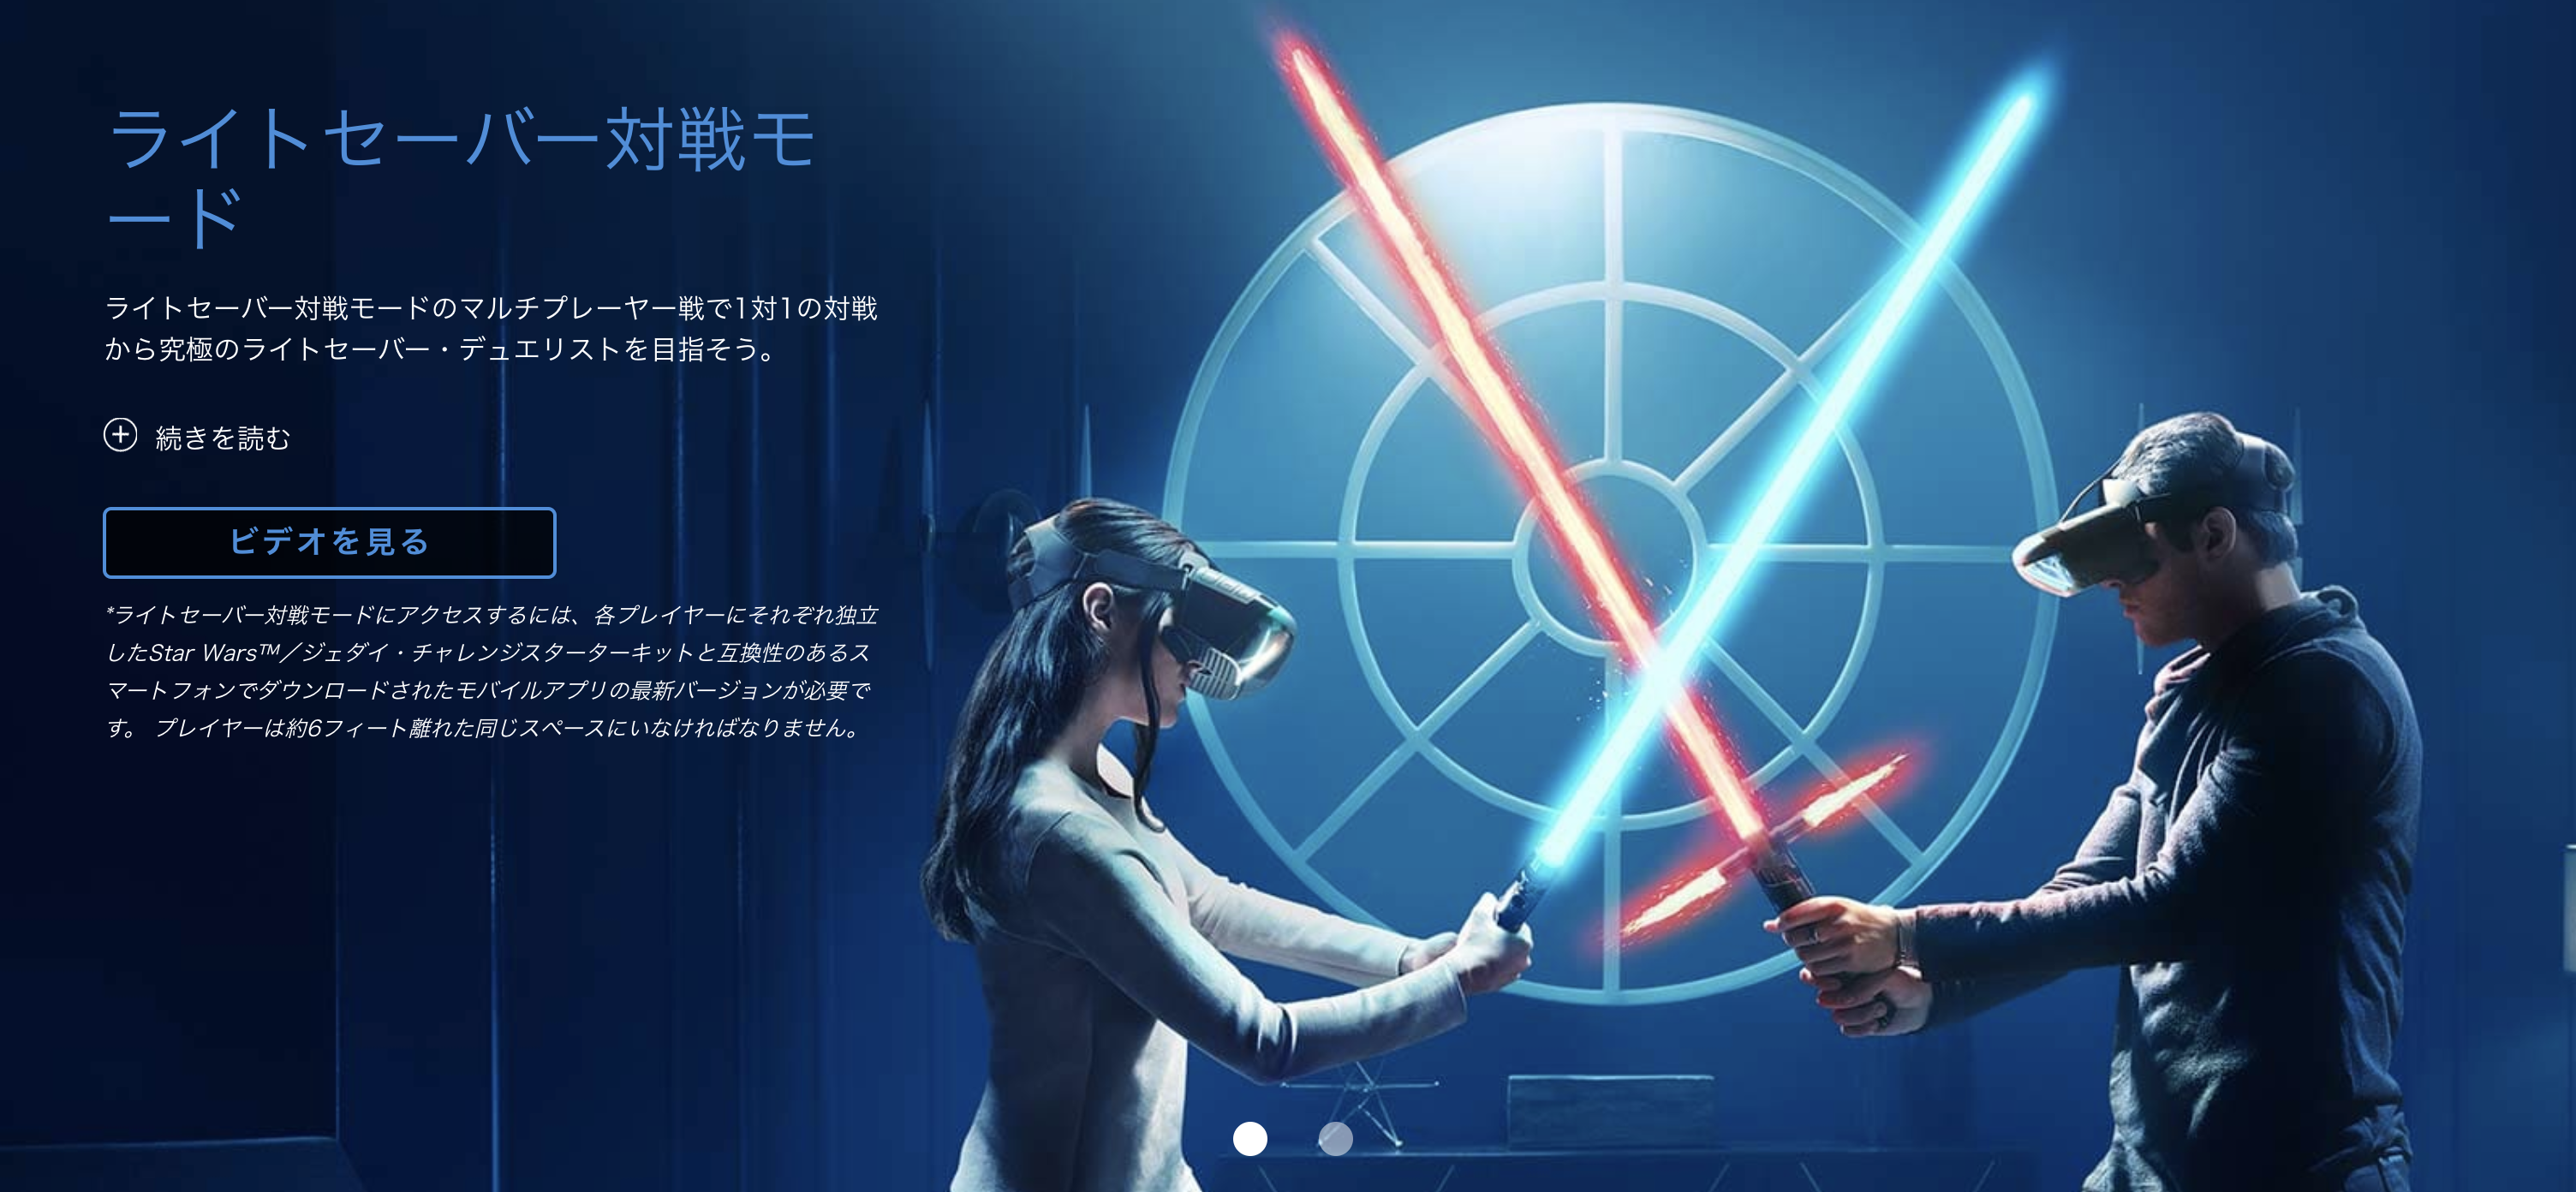 ARアプリ「ジェダイ・チャレンジ」のイメージ画像